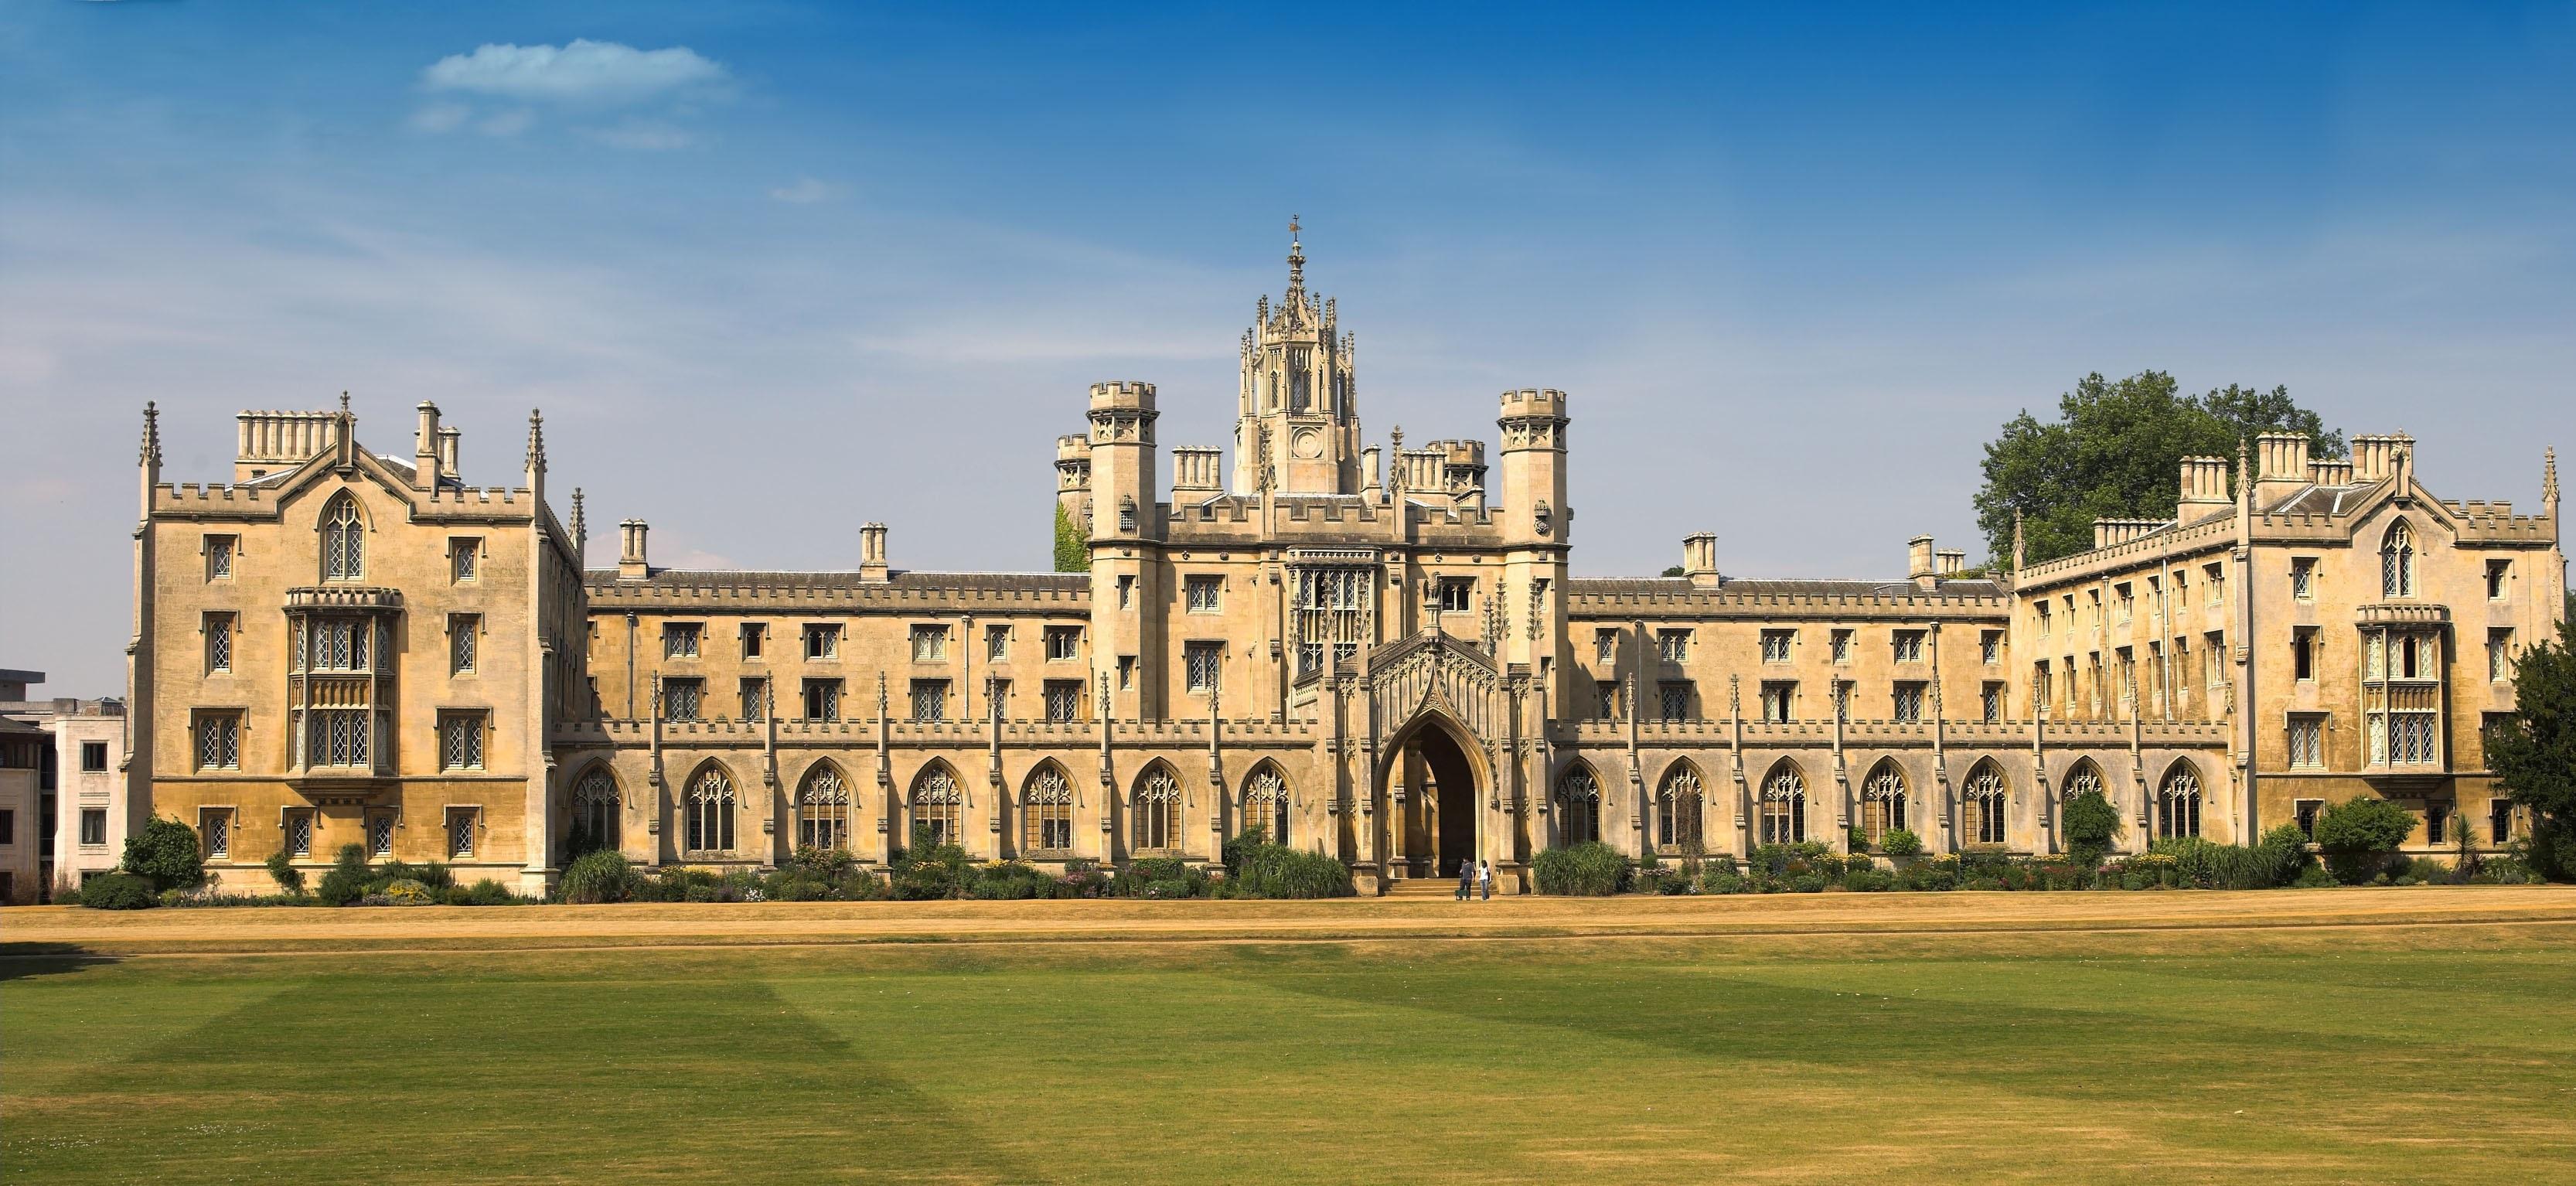 Pictures Of Cambridge